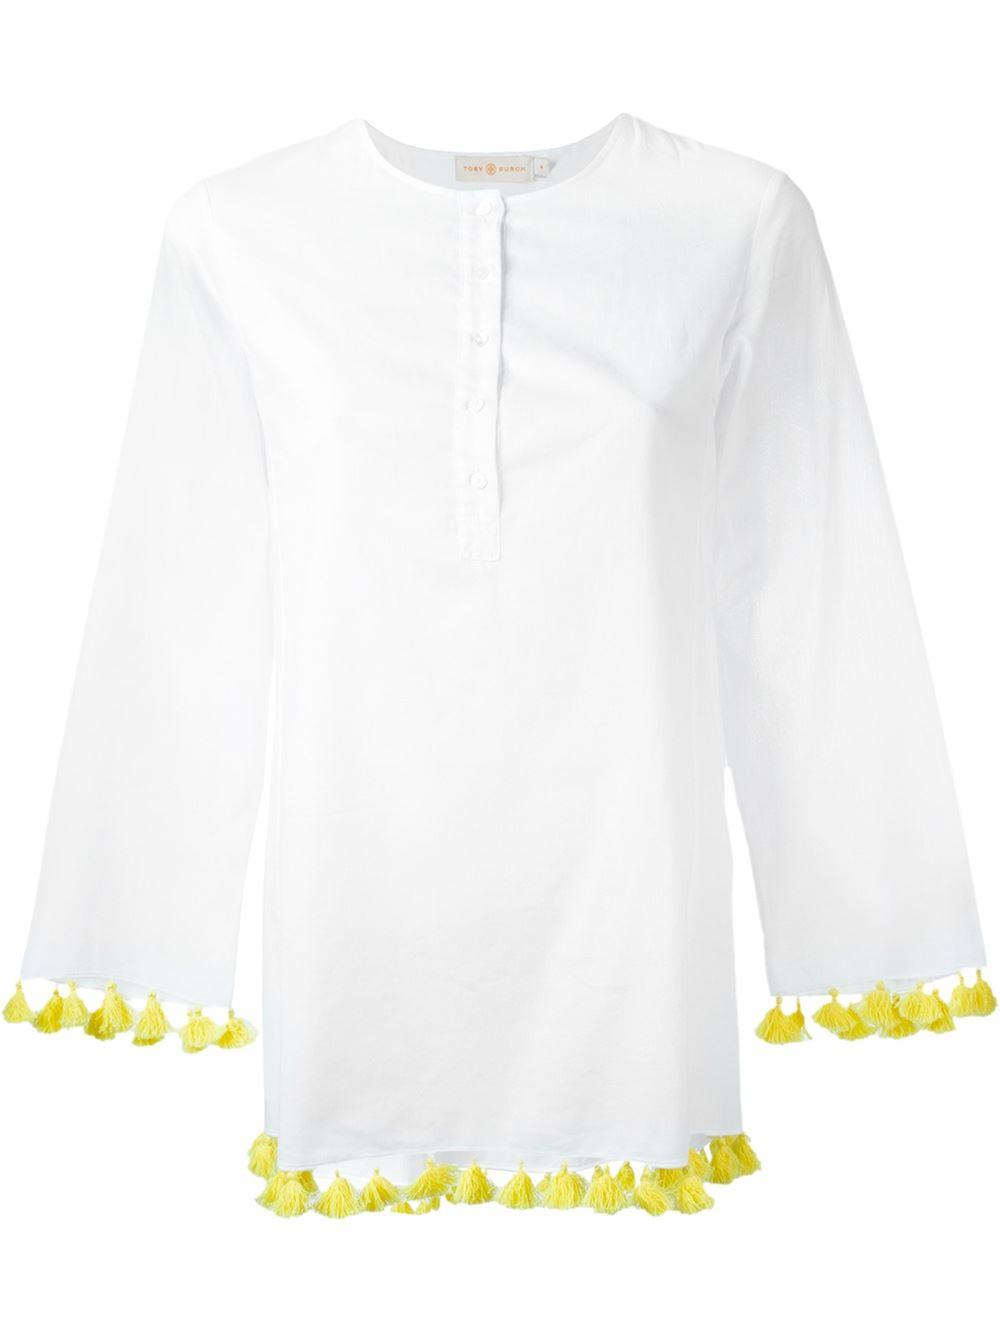 Tory burch tassel hem button down blouse in yellow lyst for Tory burch button down shirt